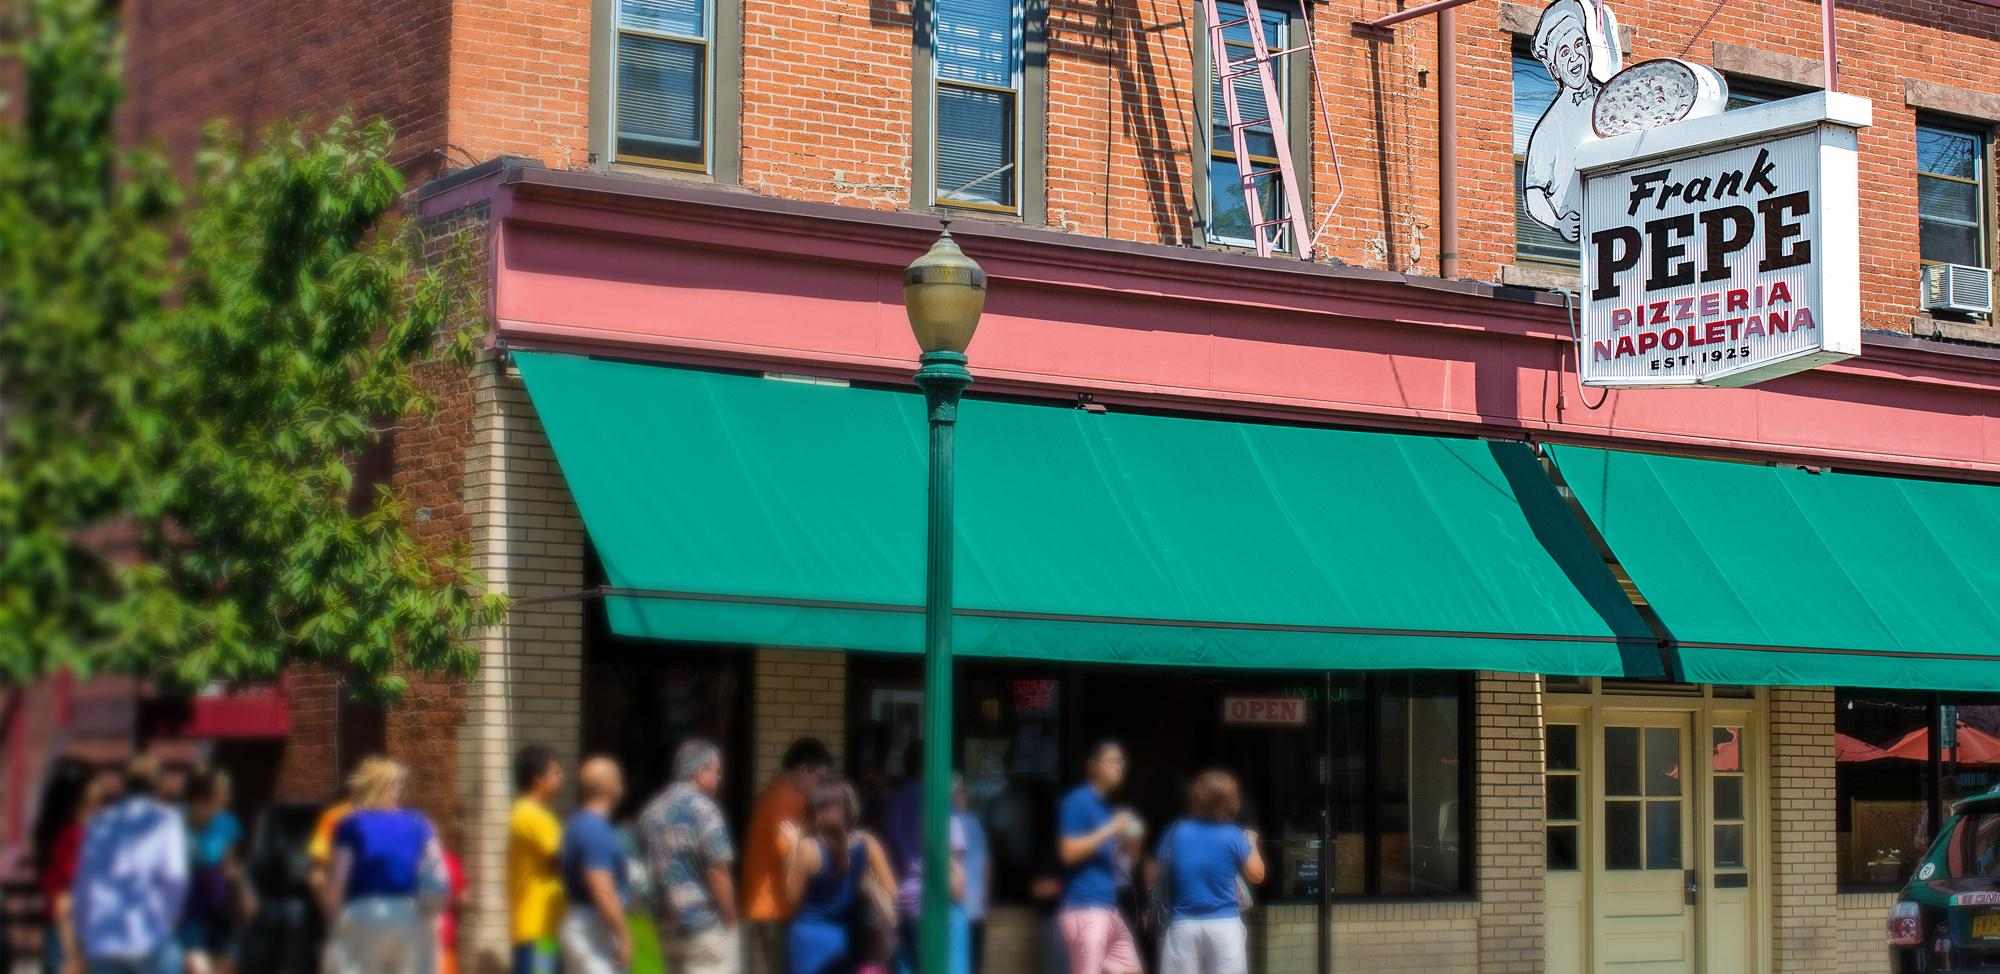 Frank Pepe Pizzeria Napoletana - New Haven